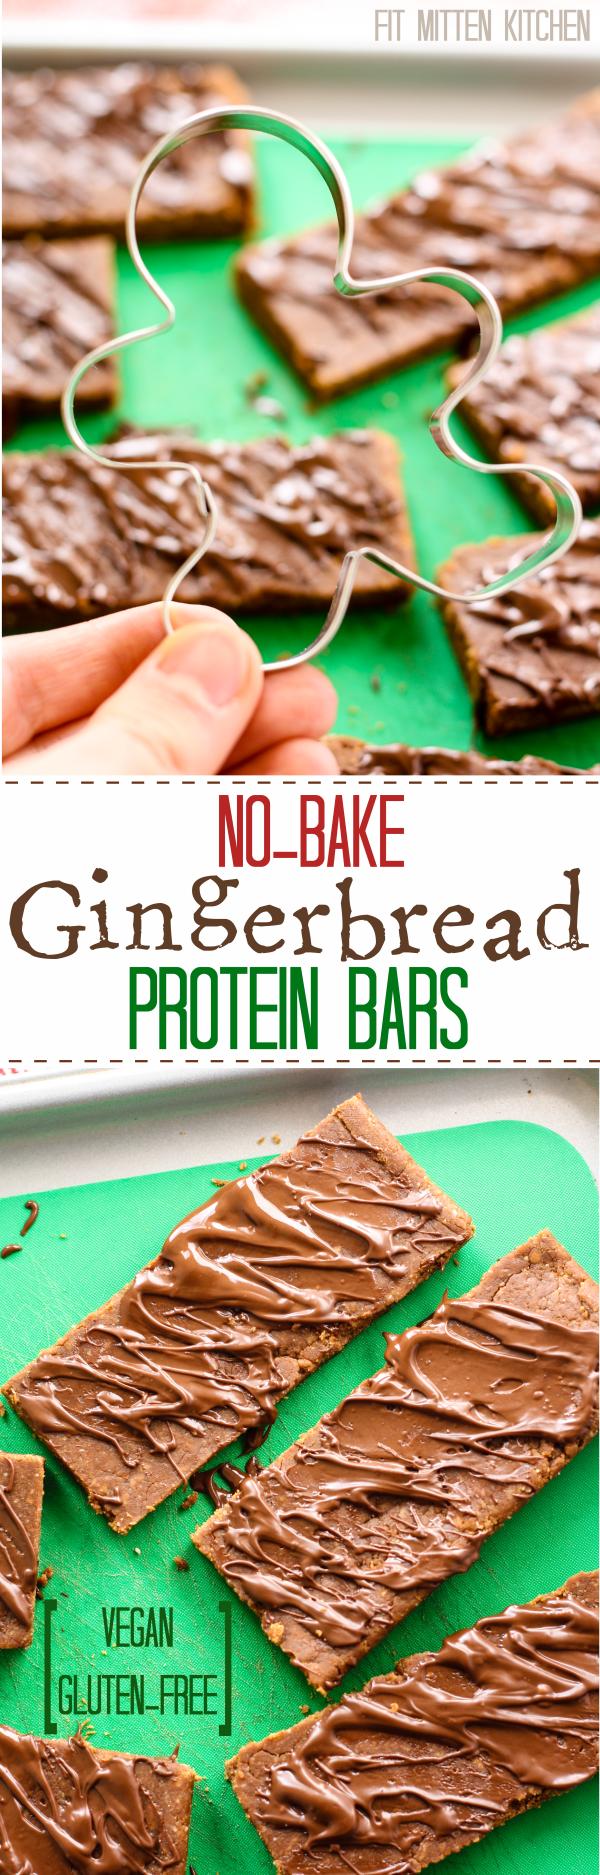 No-Bake Gingerbread Protein Bars [Fit Mitten Kitchen]